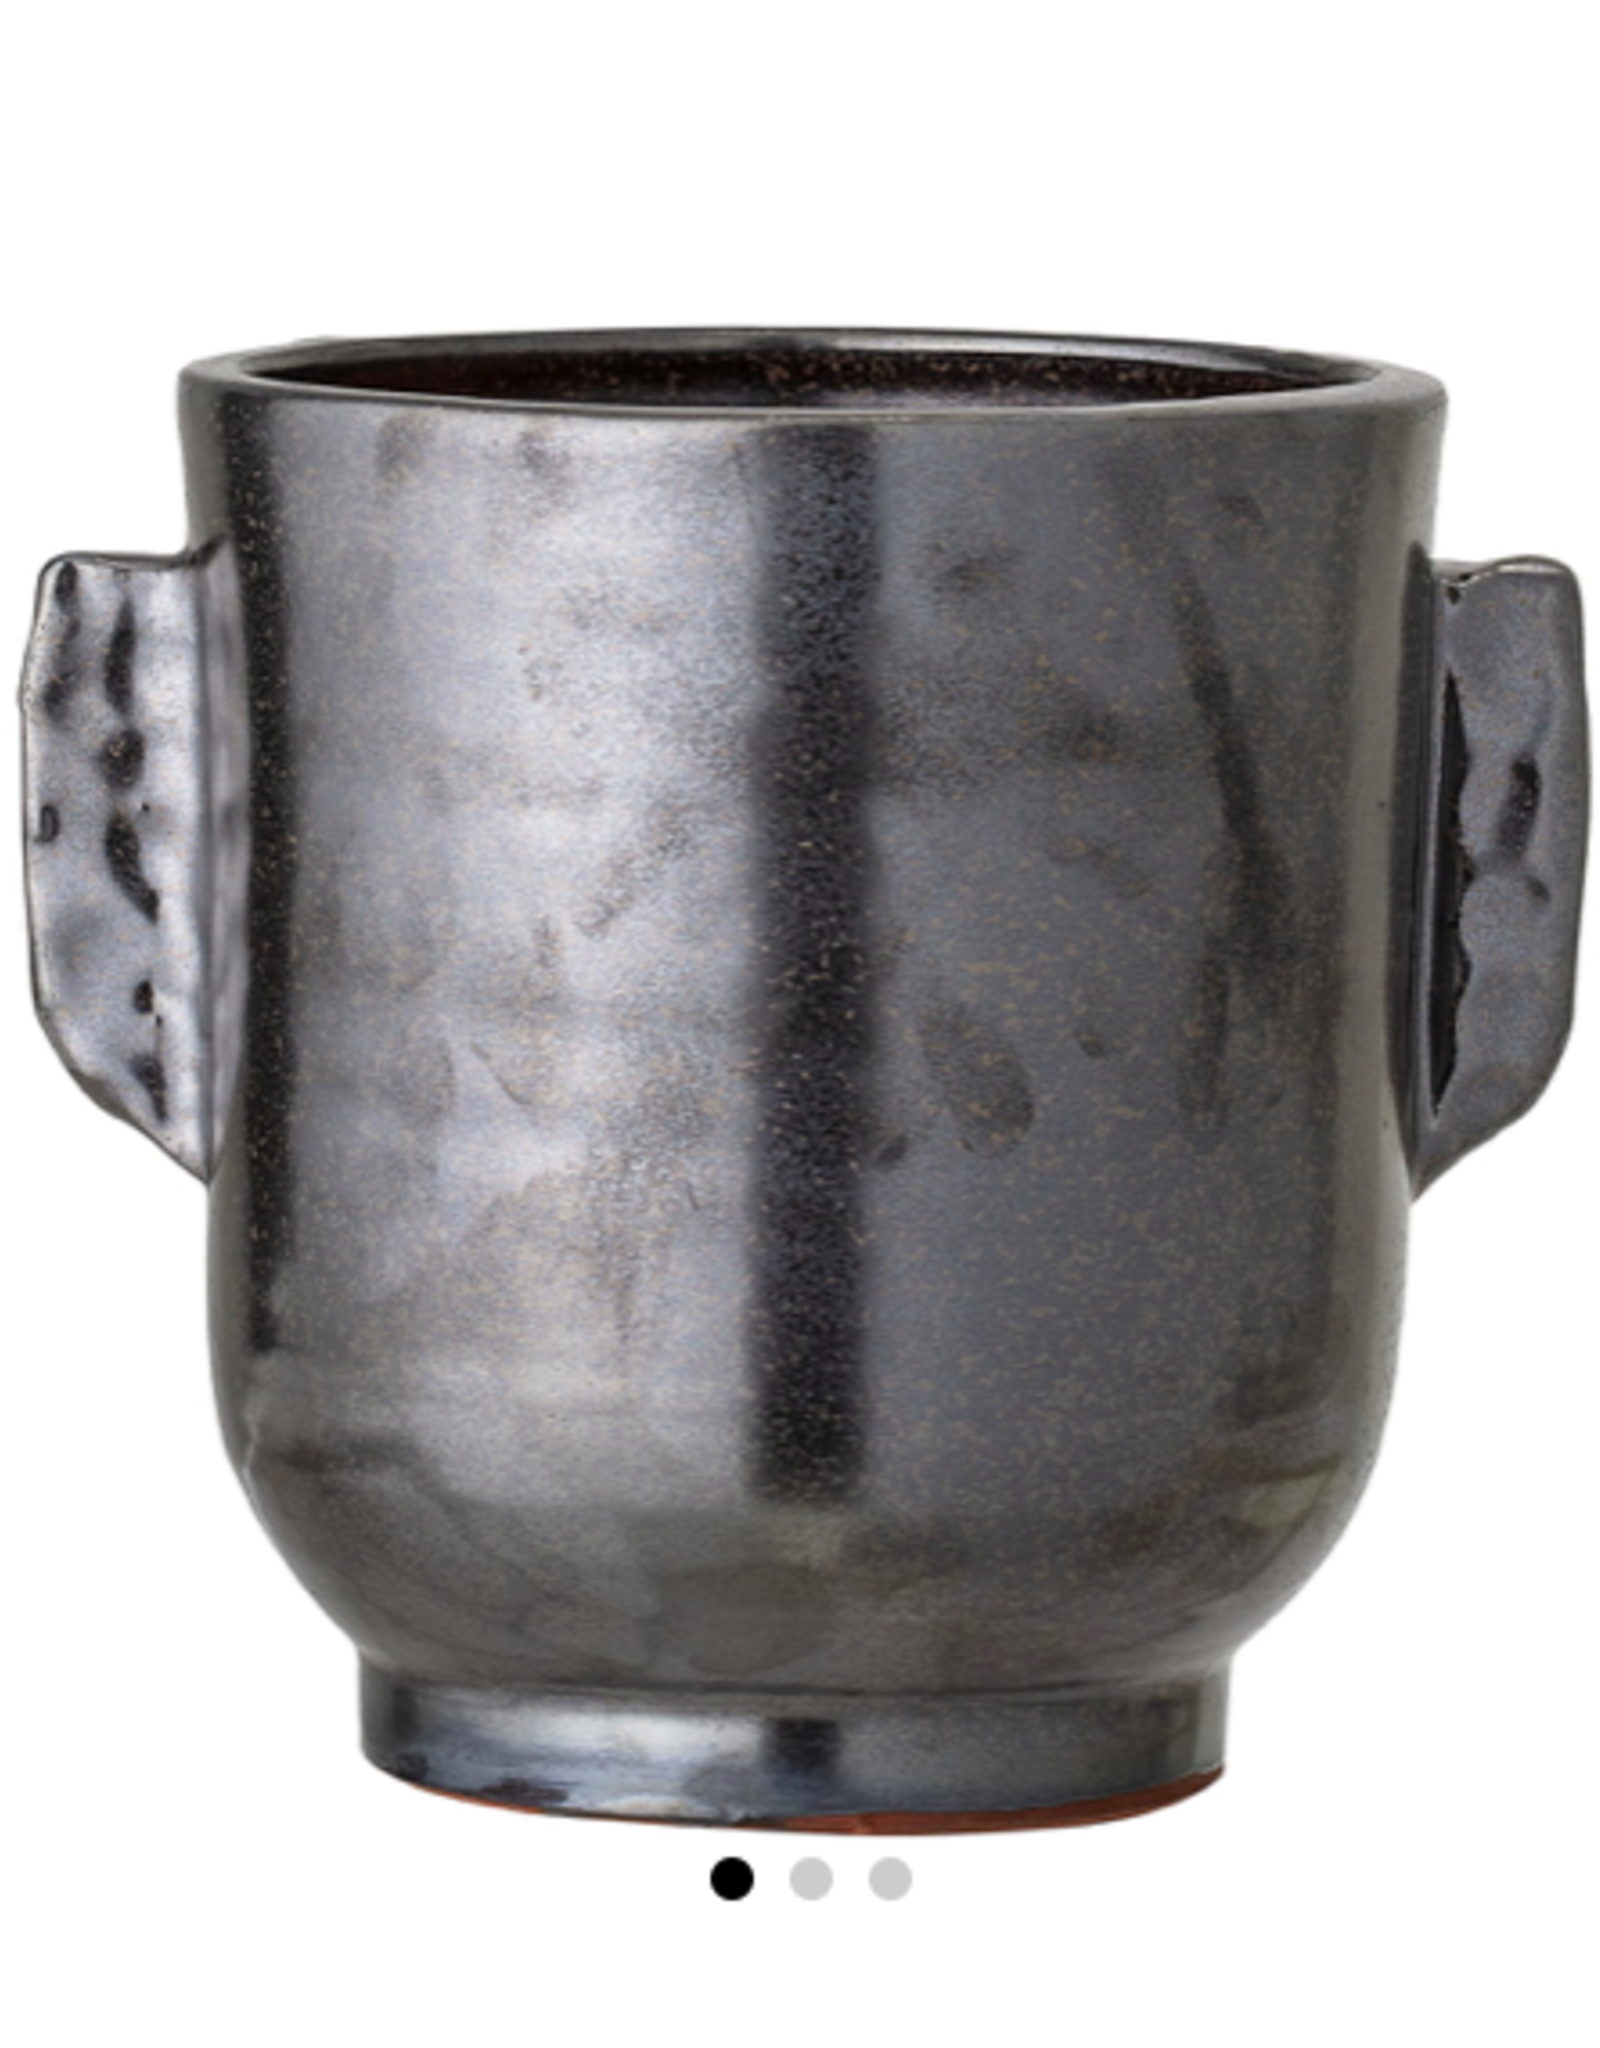 Bloomingville Bloomingville - deco flowerpot black terracotta M